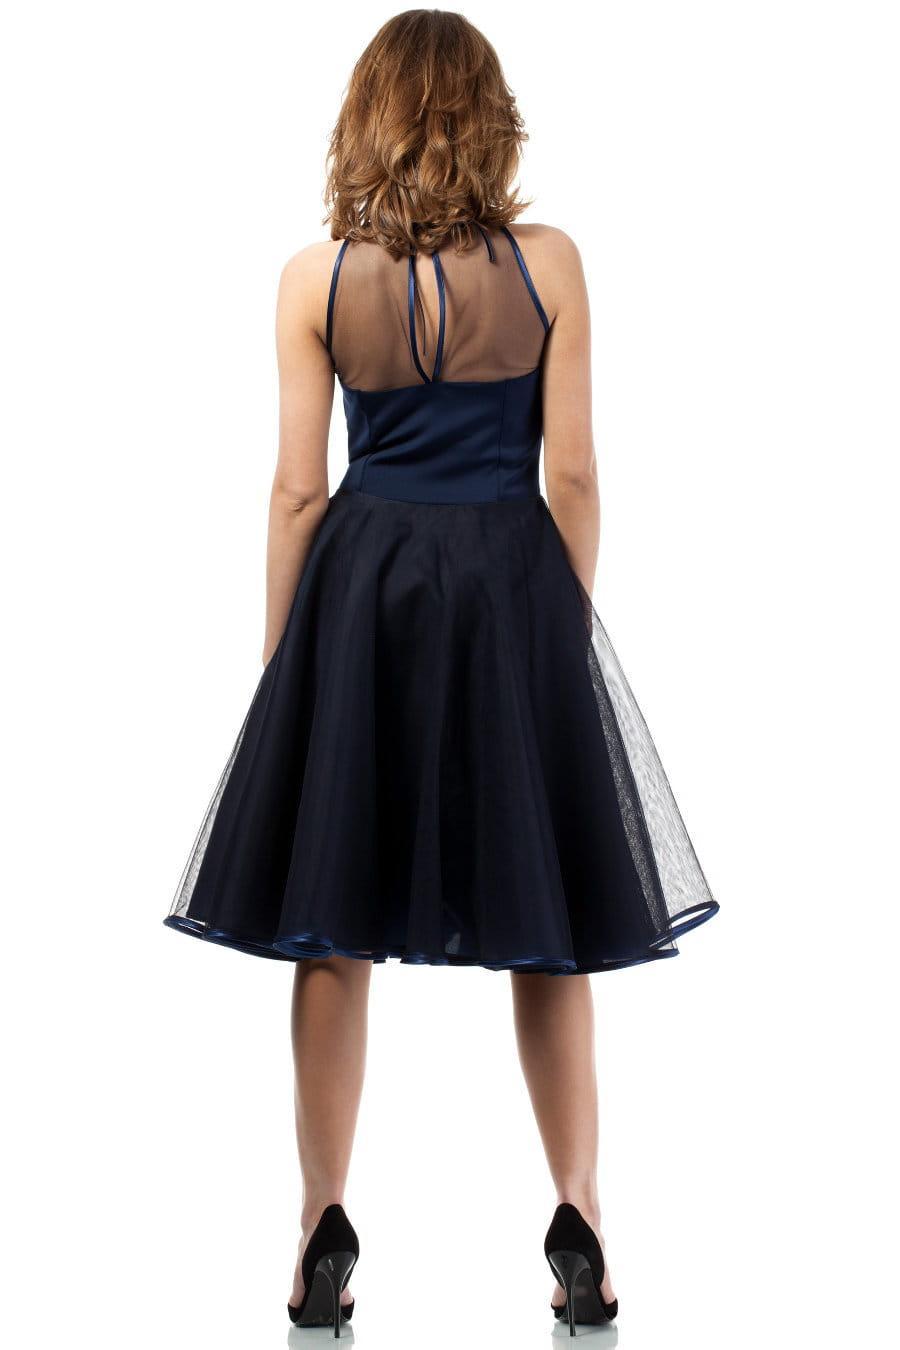 3faeee03c7 Sukienka Wieczorowa z Tiulem Granatowa MOE148 BESIMA.pl